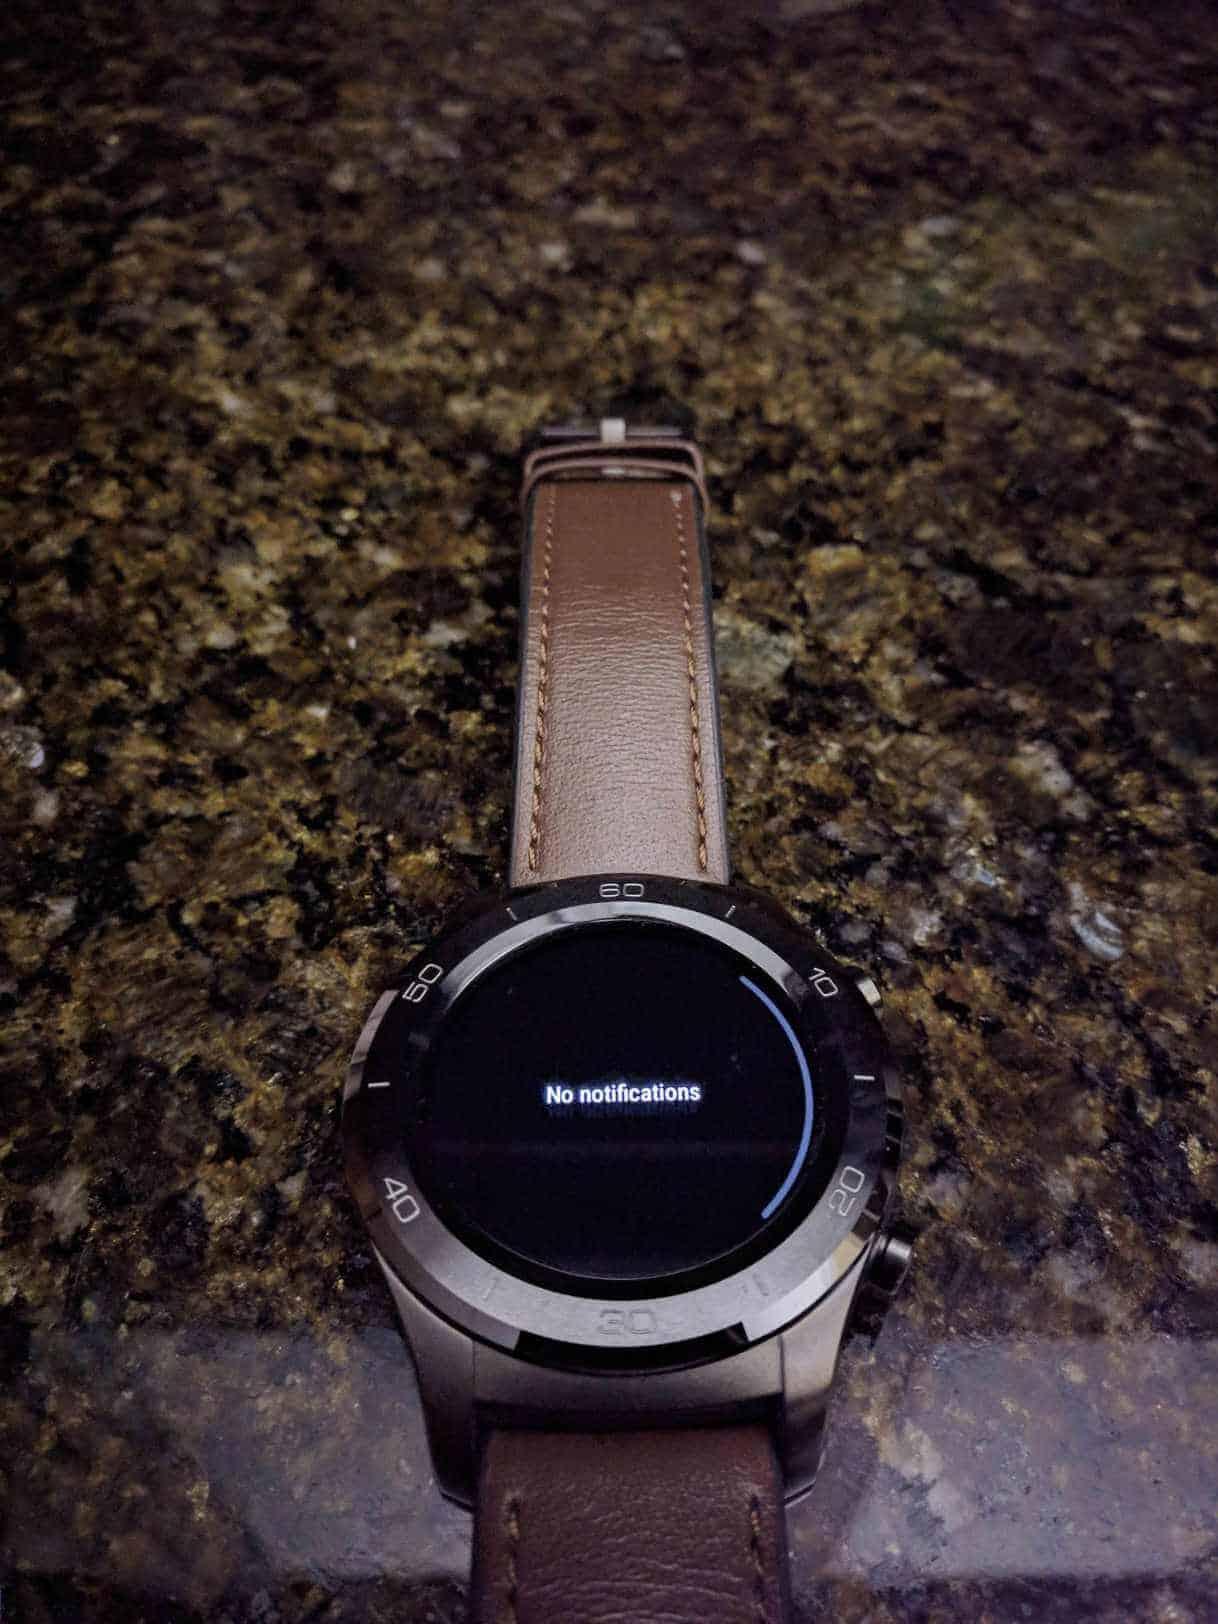 Yozakgg Reddit uploaded purported image of Android Wear 28 dark theme 04